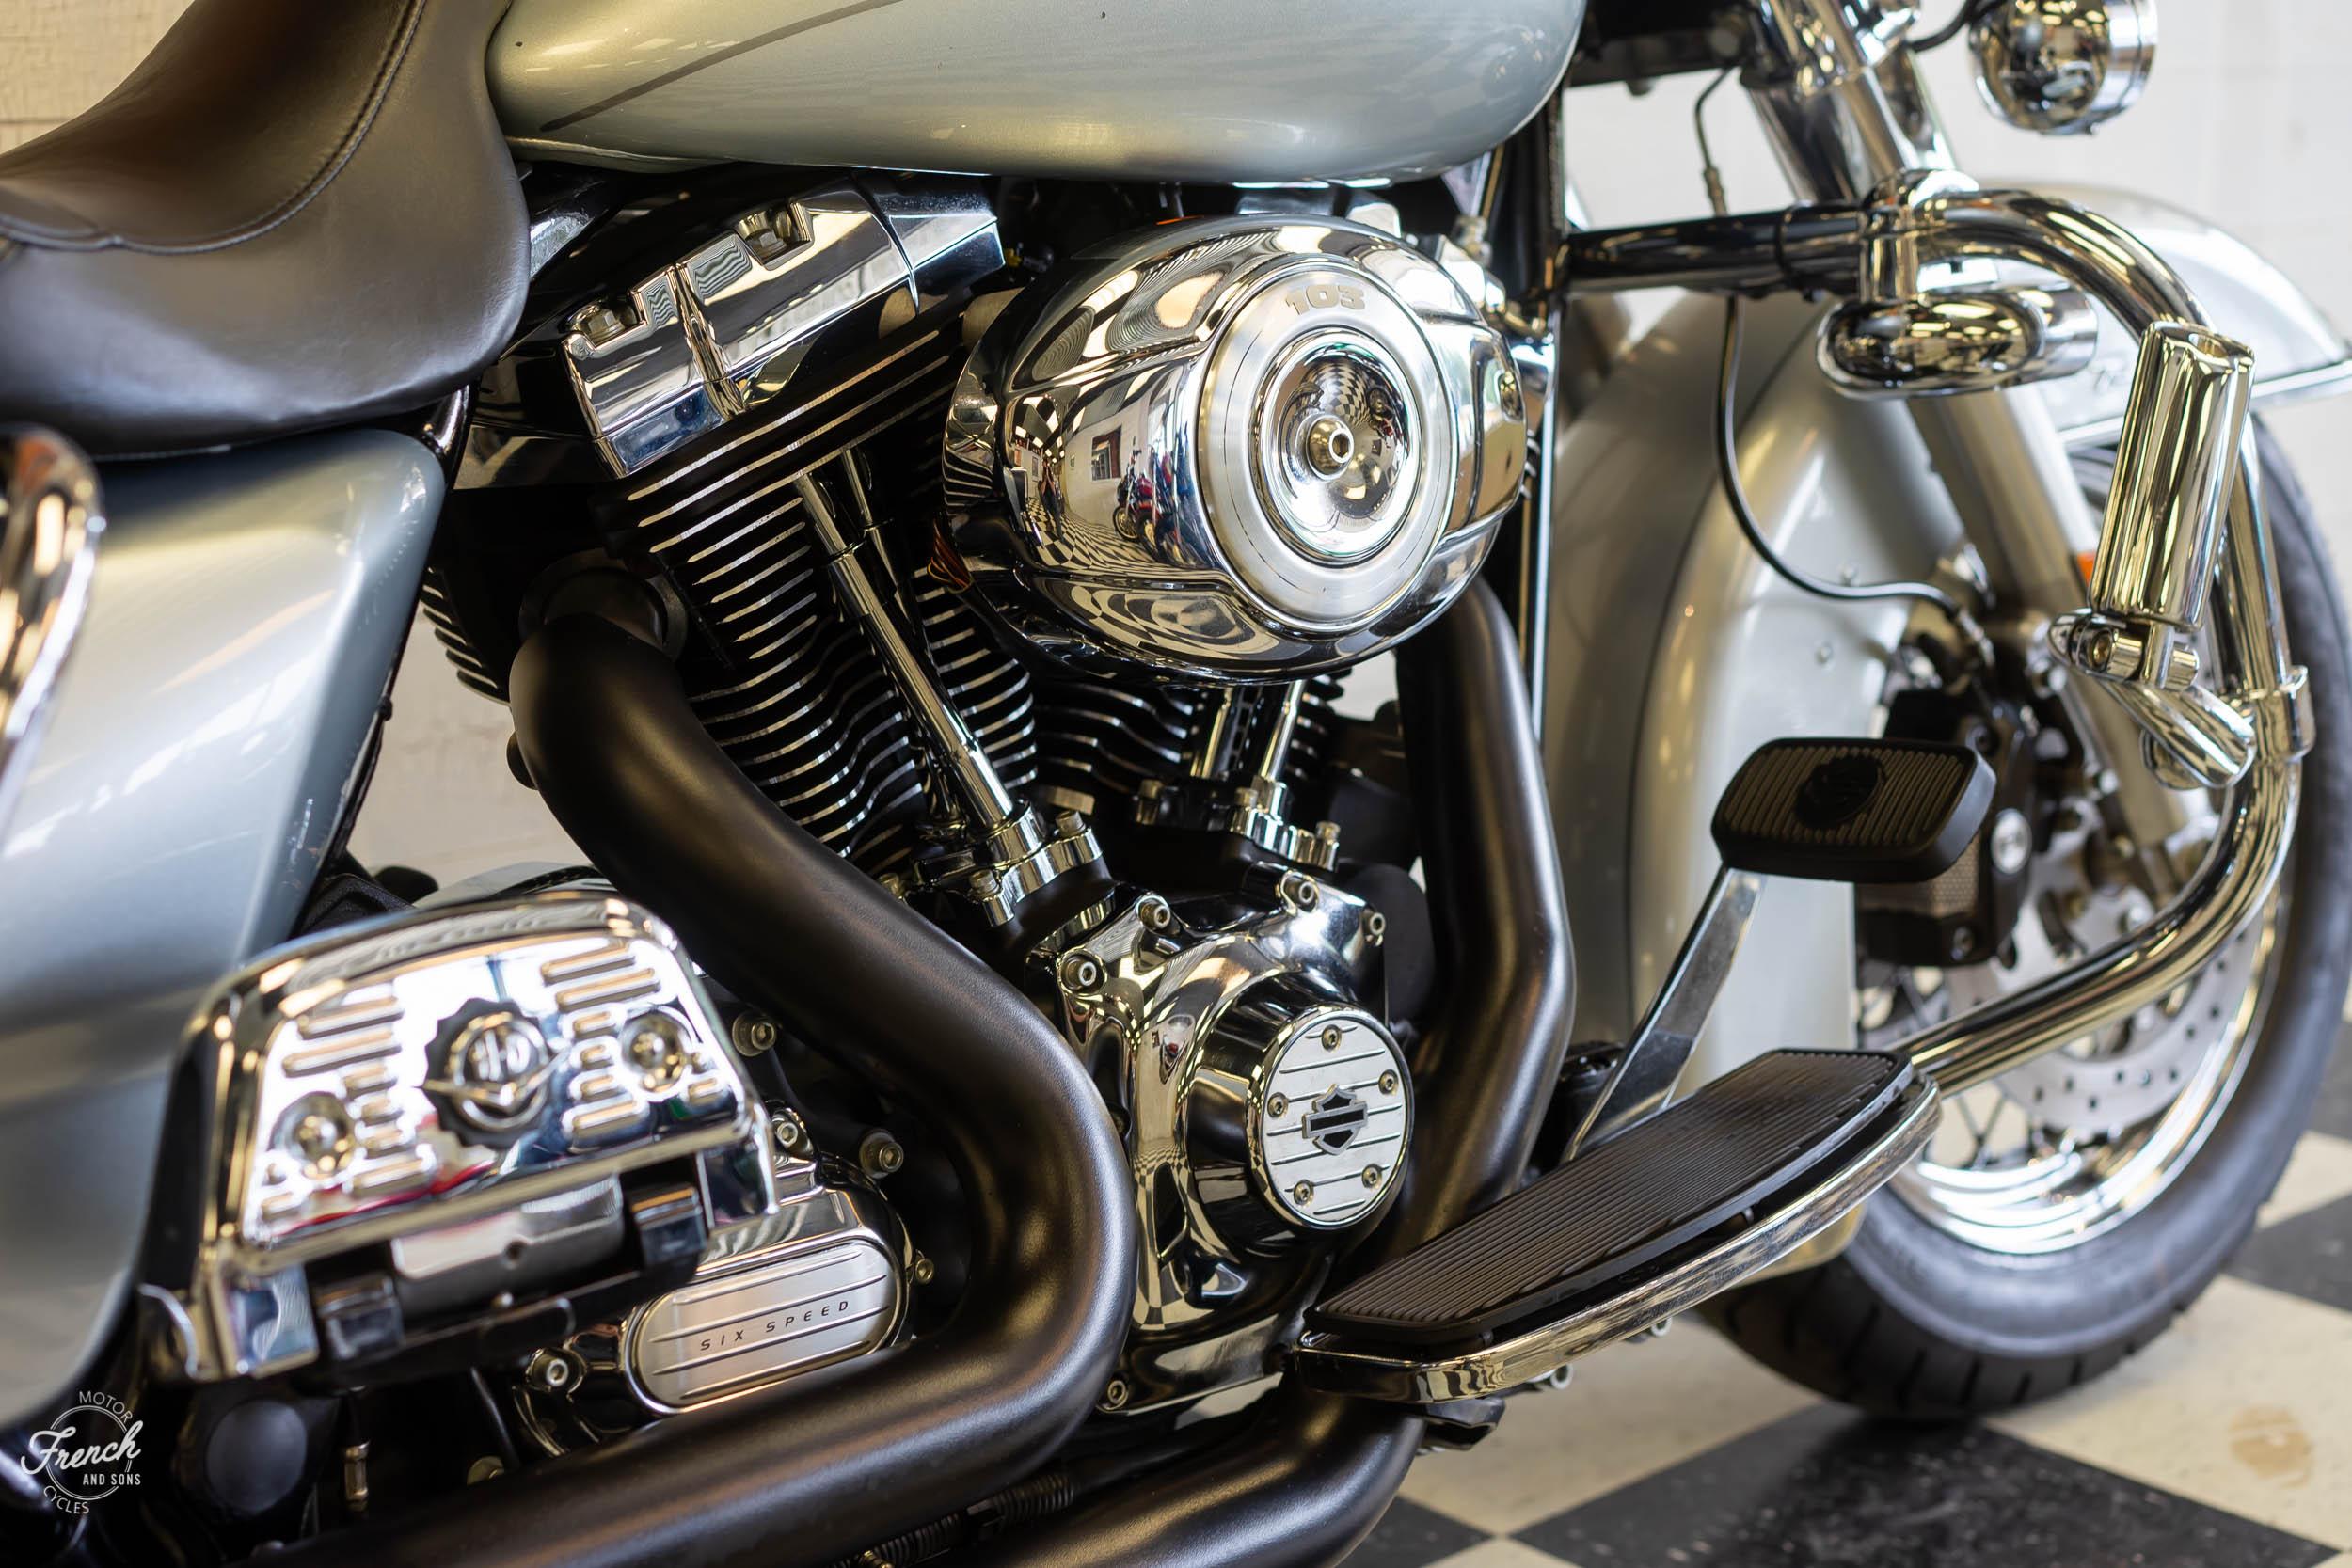 2011_Harley_davidson_road_king_silver-10.jpg